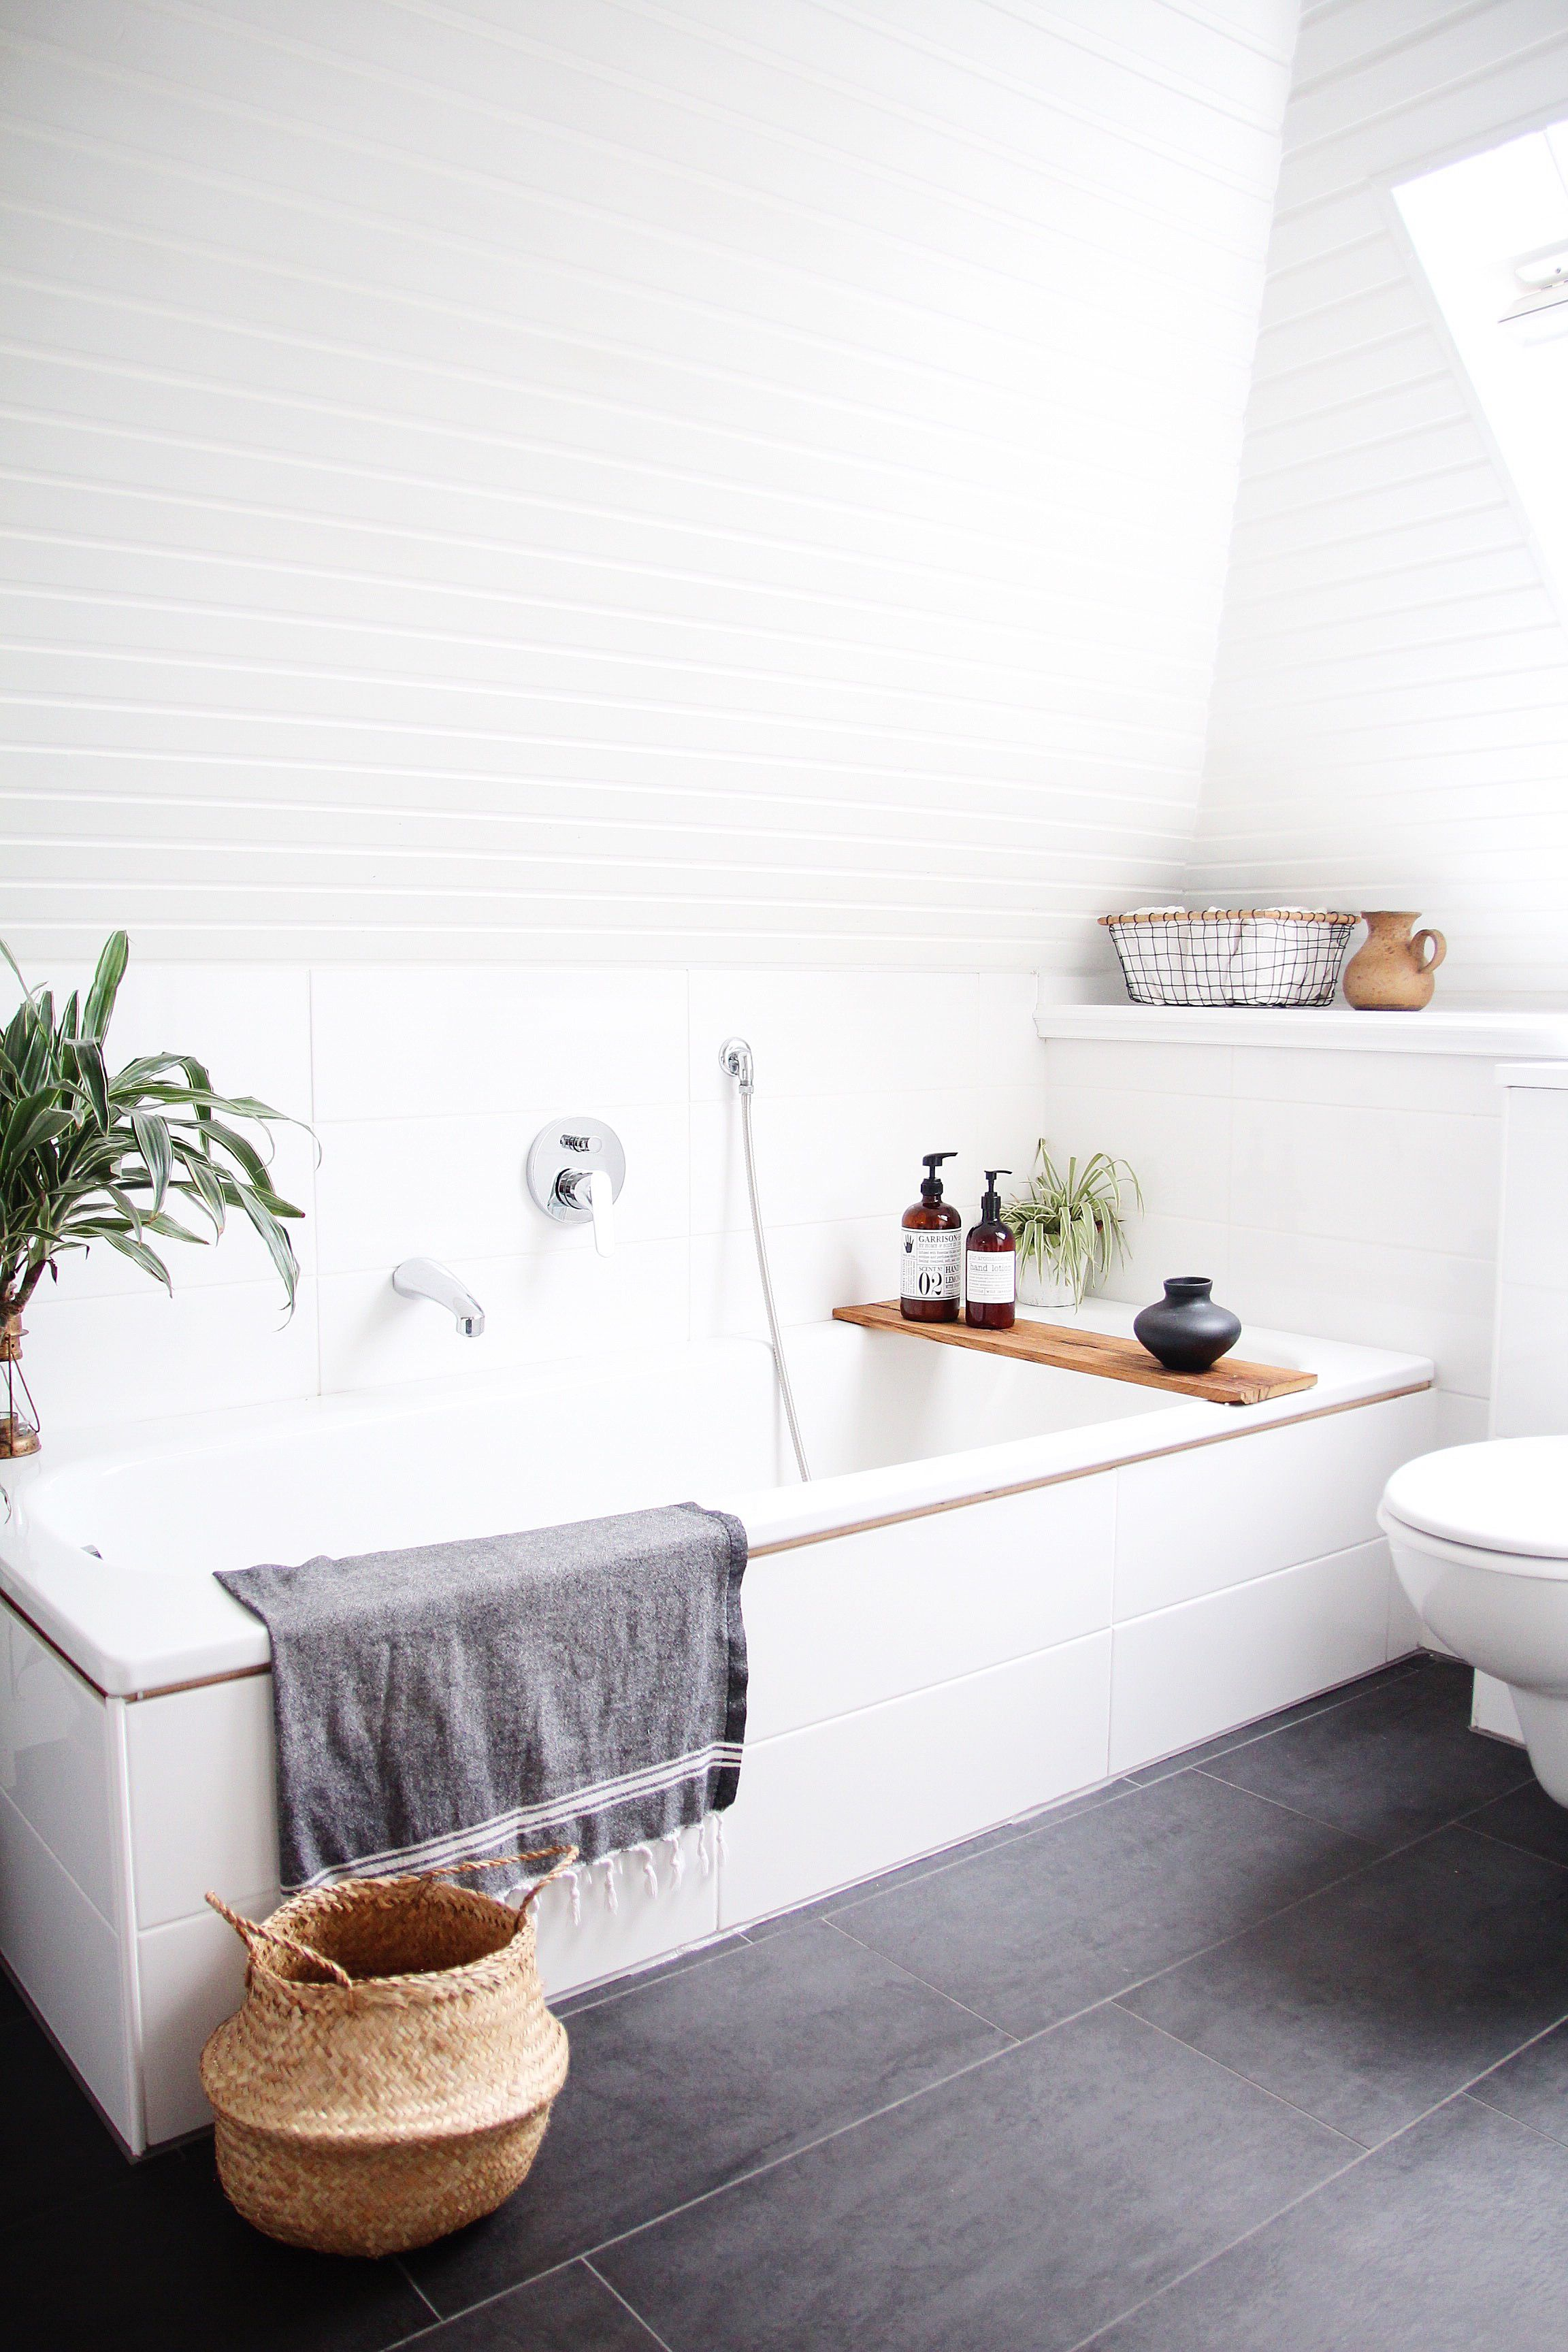 badezimmer selbst renovieren light balls pinterest. Black Bedroom Furniture Sets. Home Design Ideas